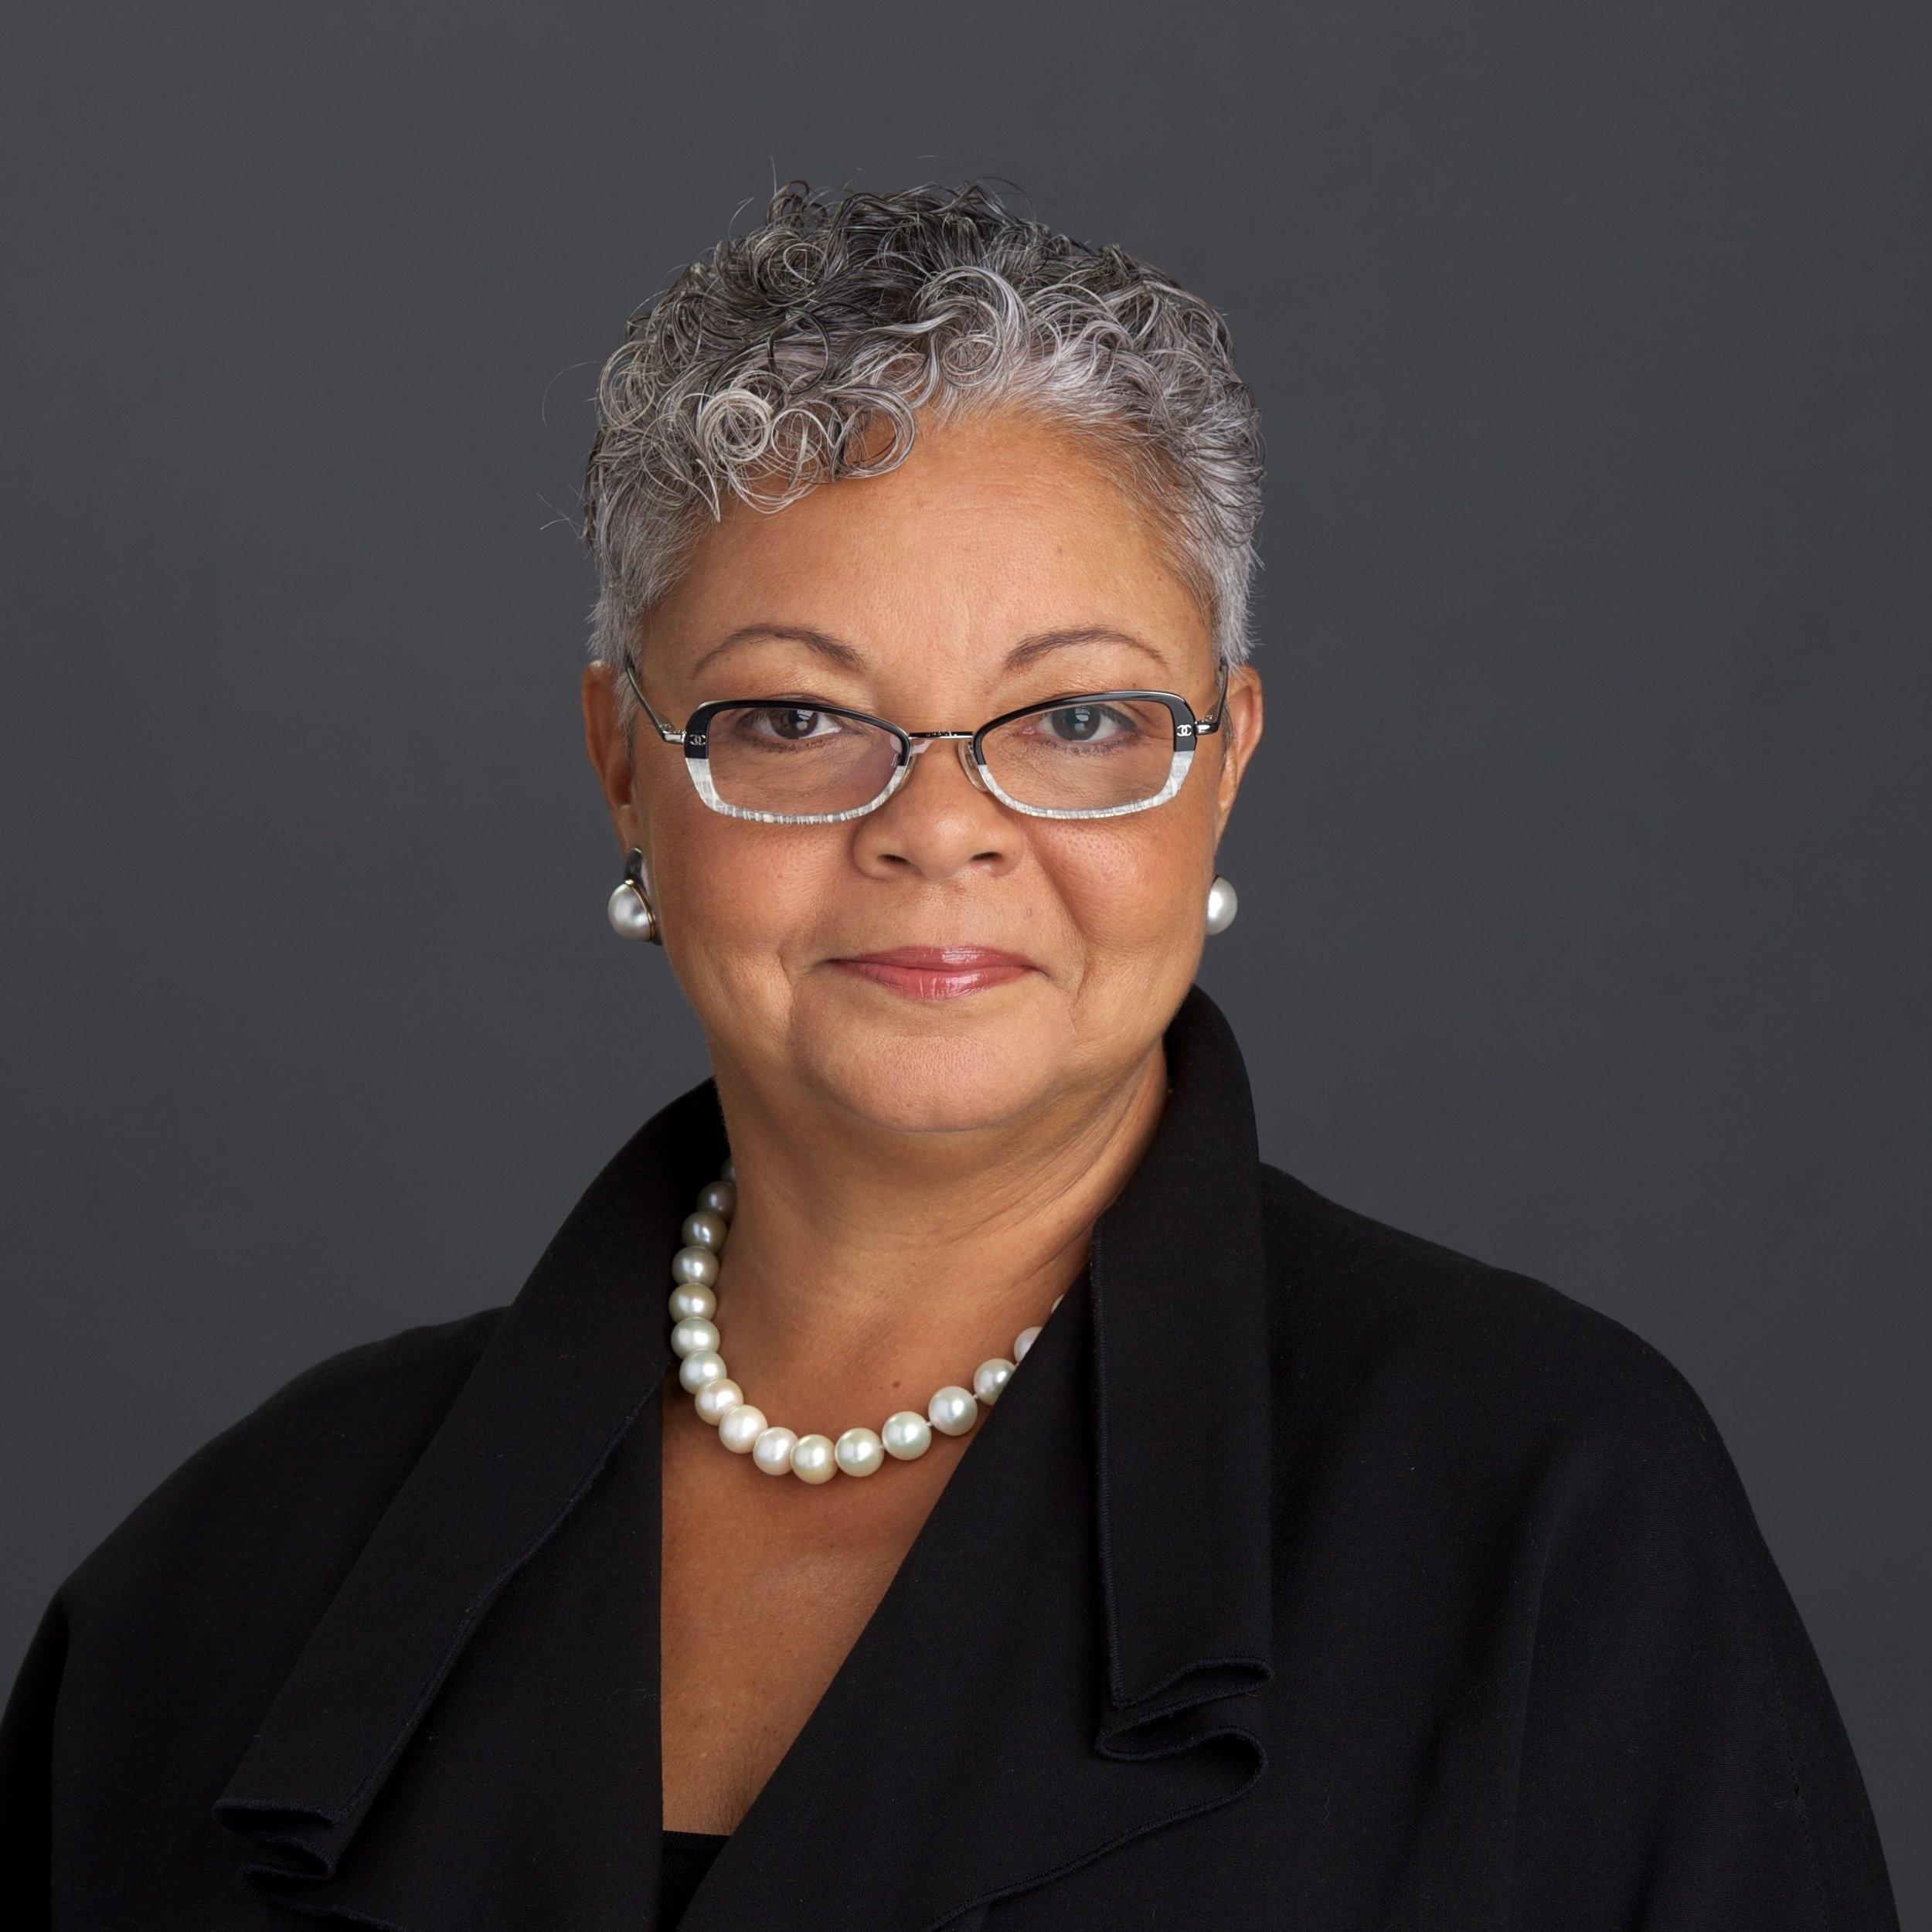 Dr. Freda Lewis Hall